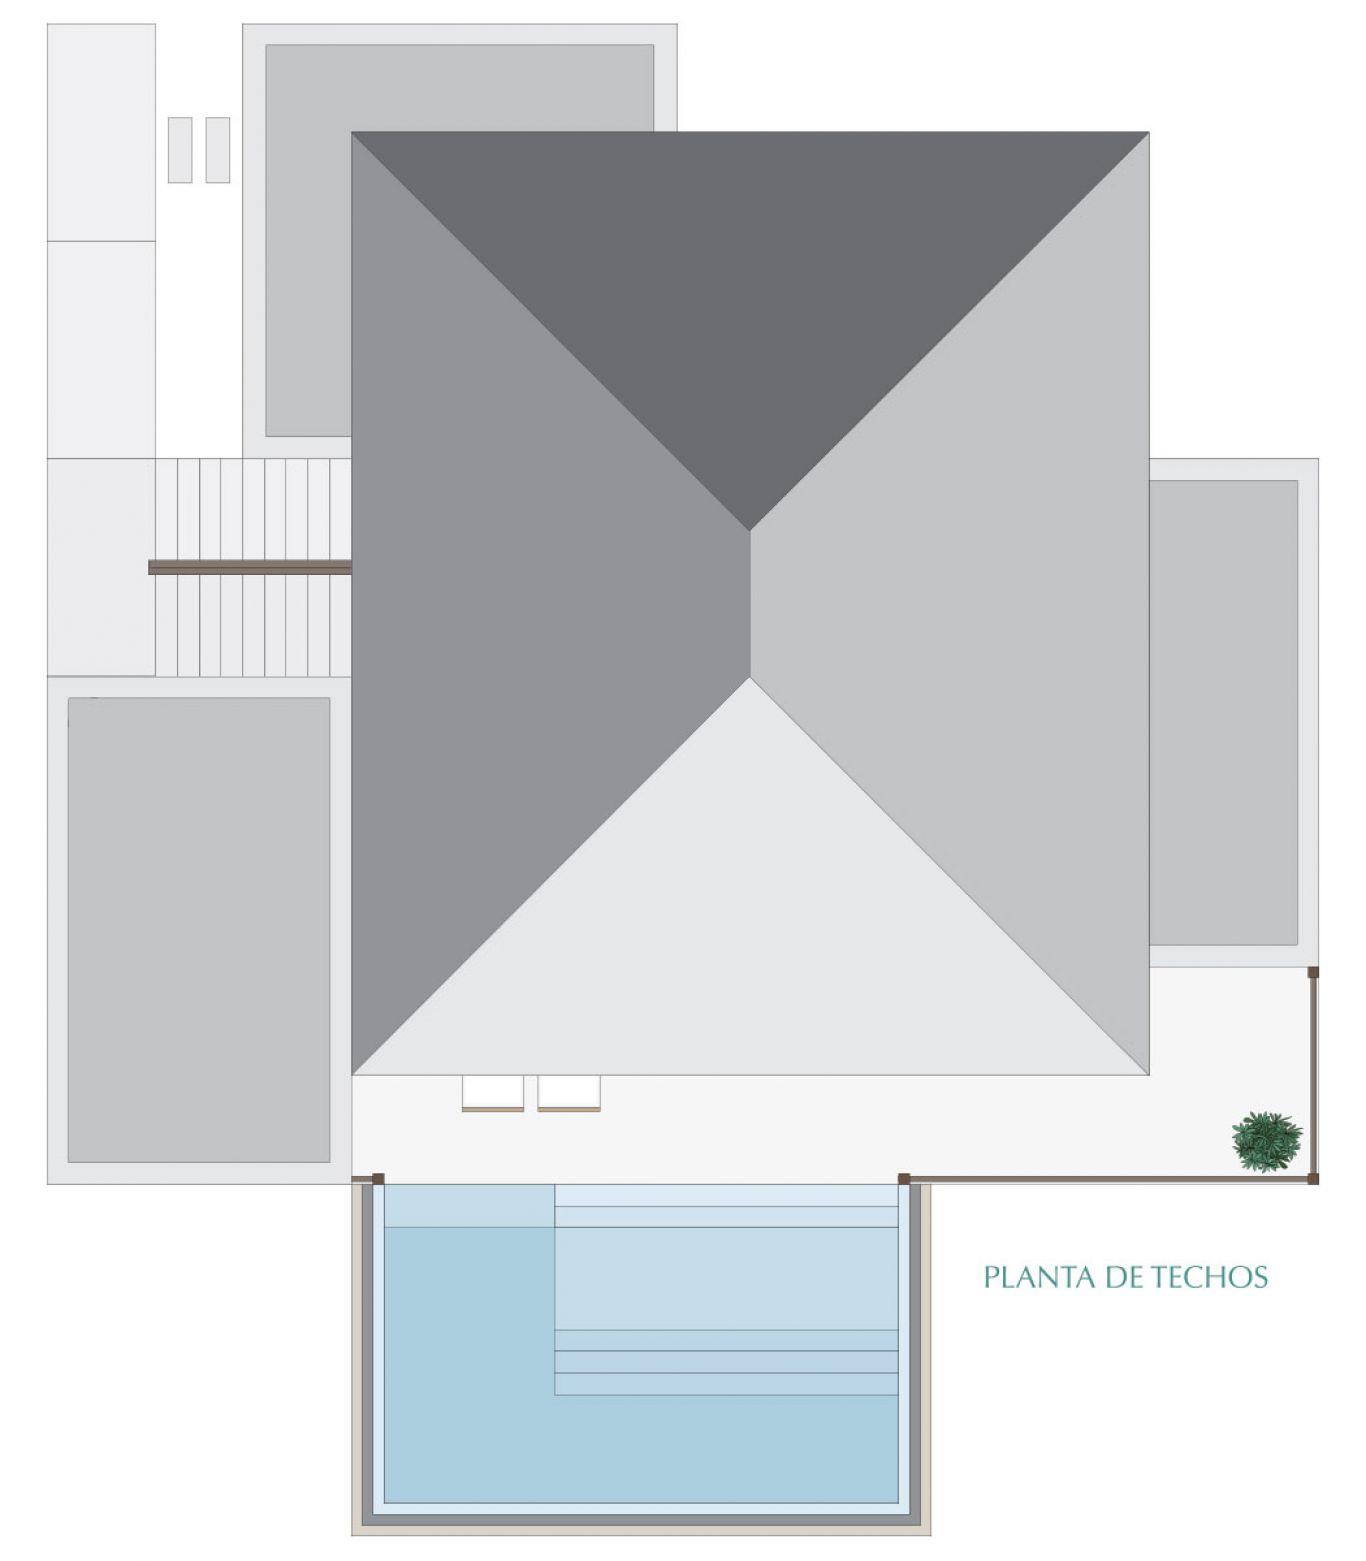 Manai, id 1519068, no 3, plano de villa 8, 288